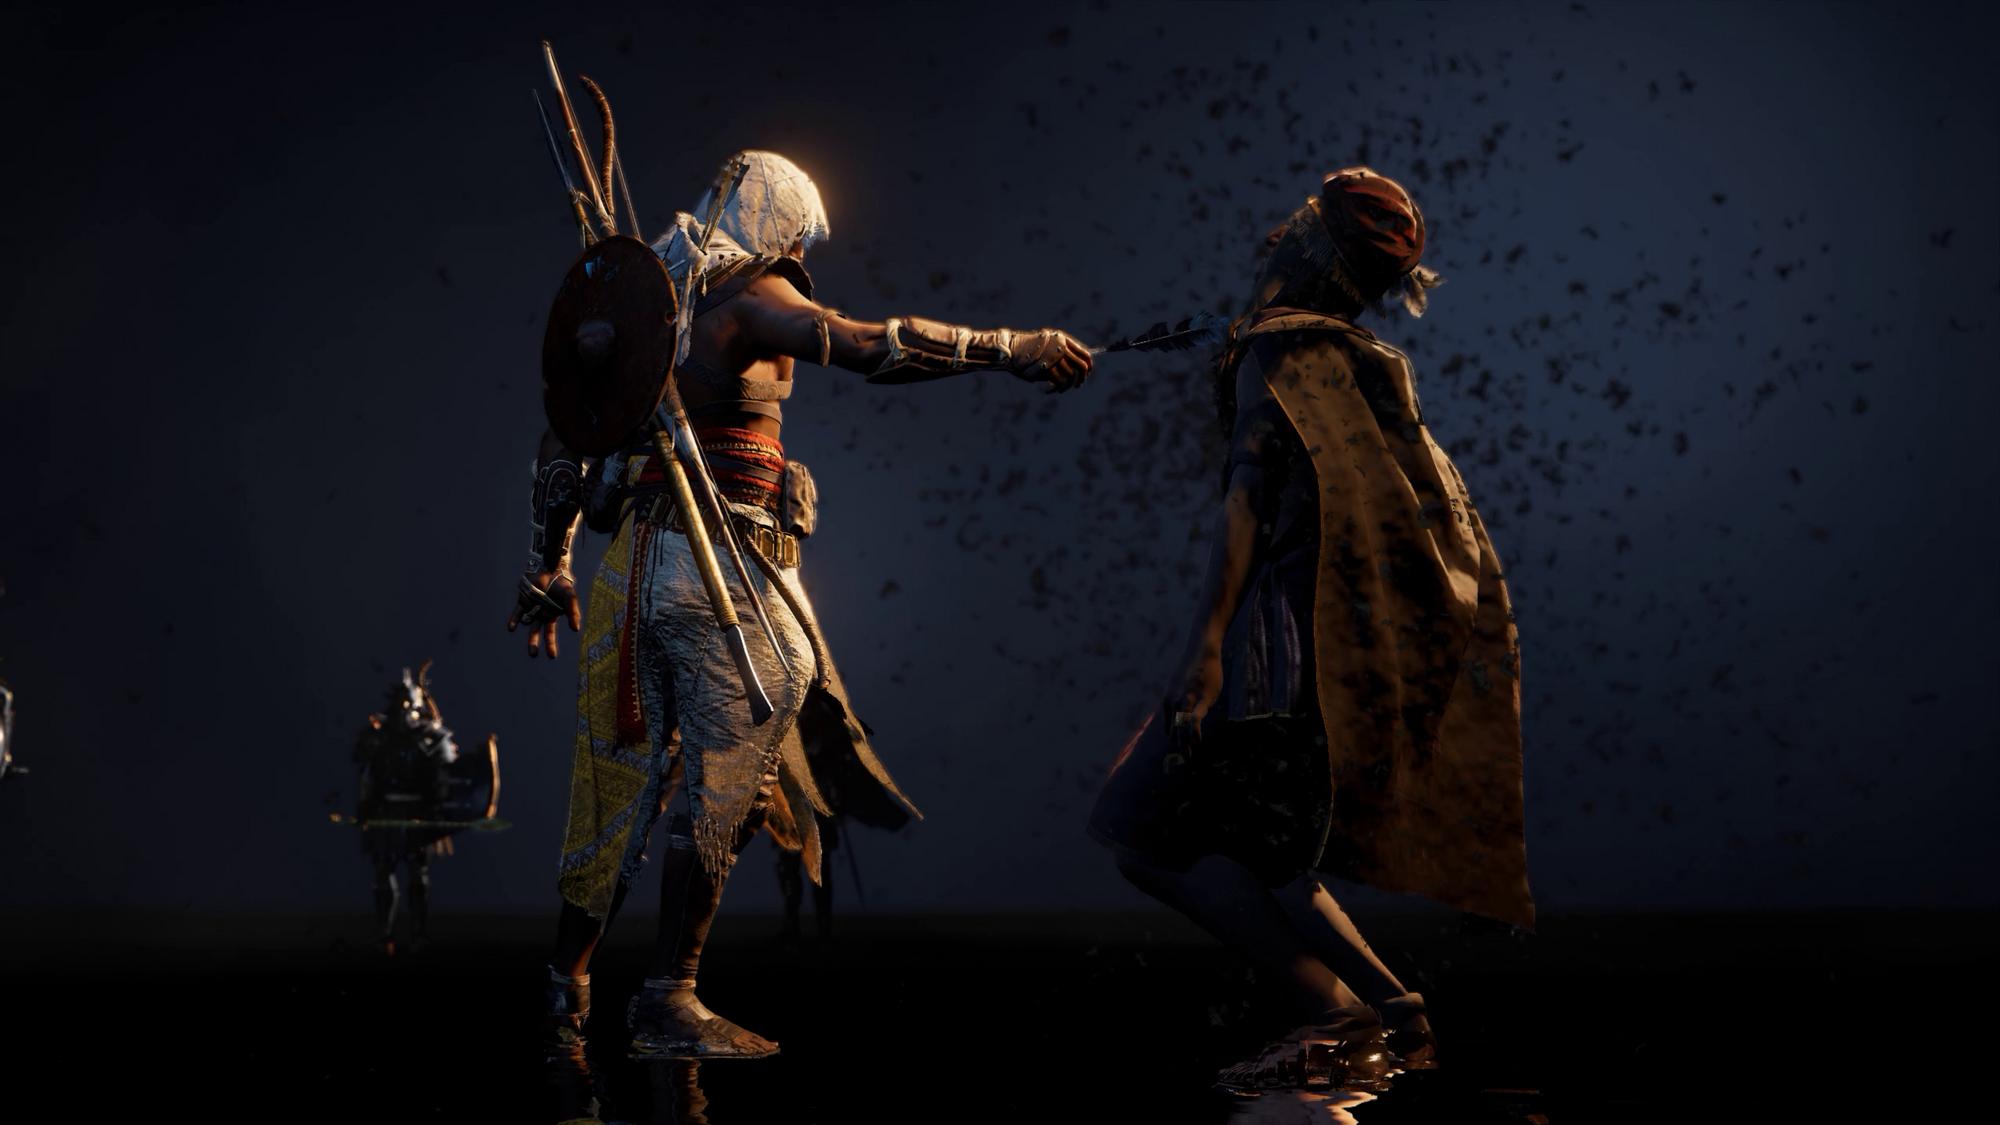 Gennadios The Phylakitai Assassins Creed Wiki Fandom